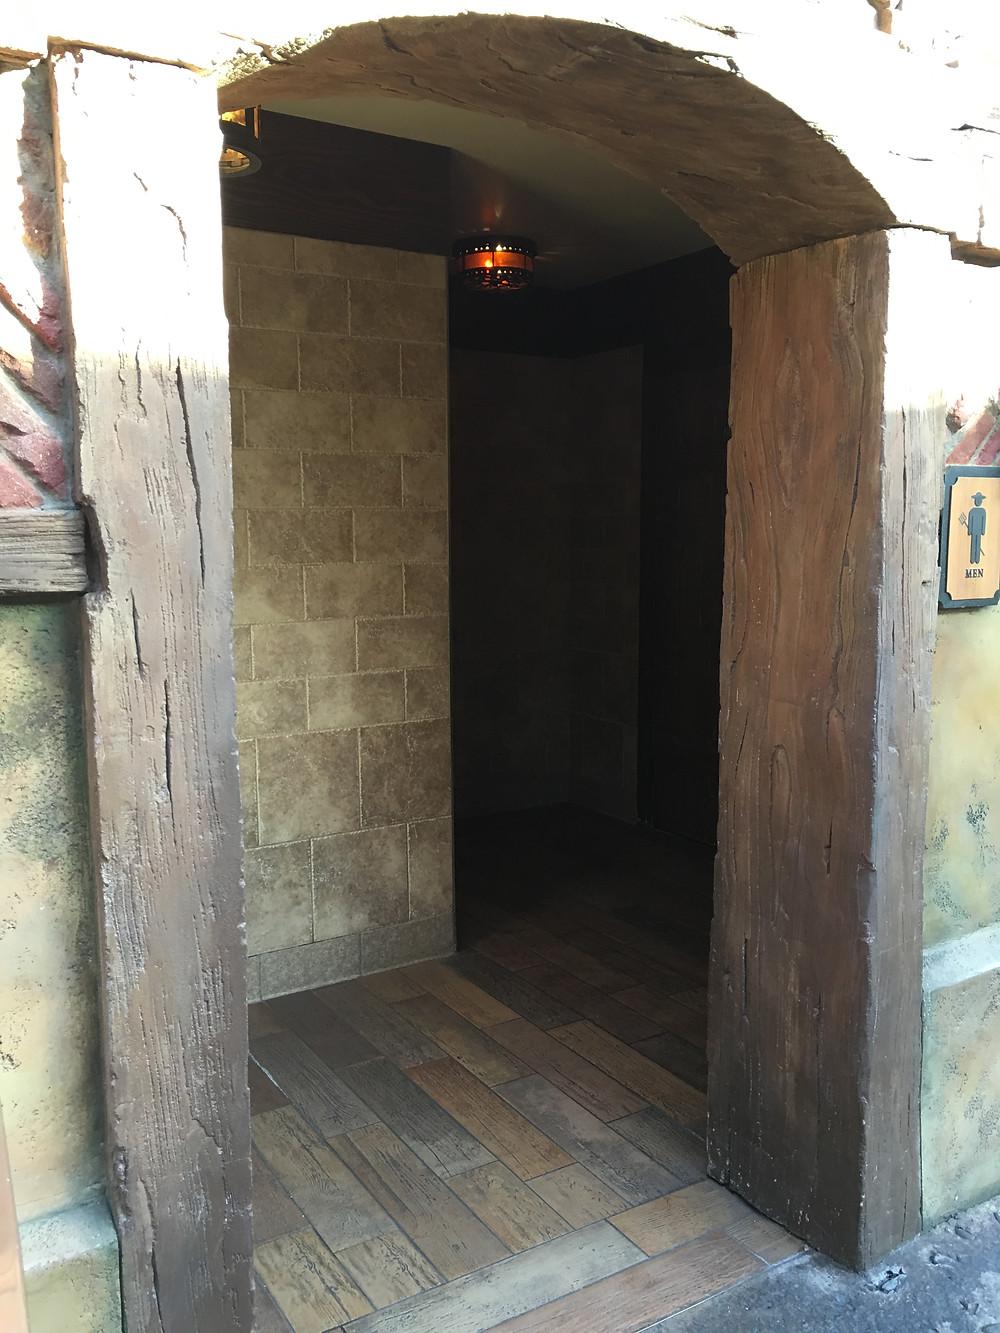 Entrance to the Men's Room, Gaston's Tavern, Magic Kingdom